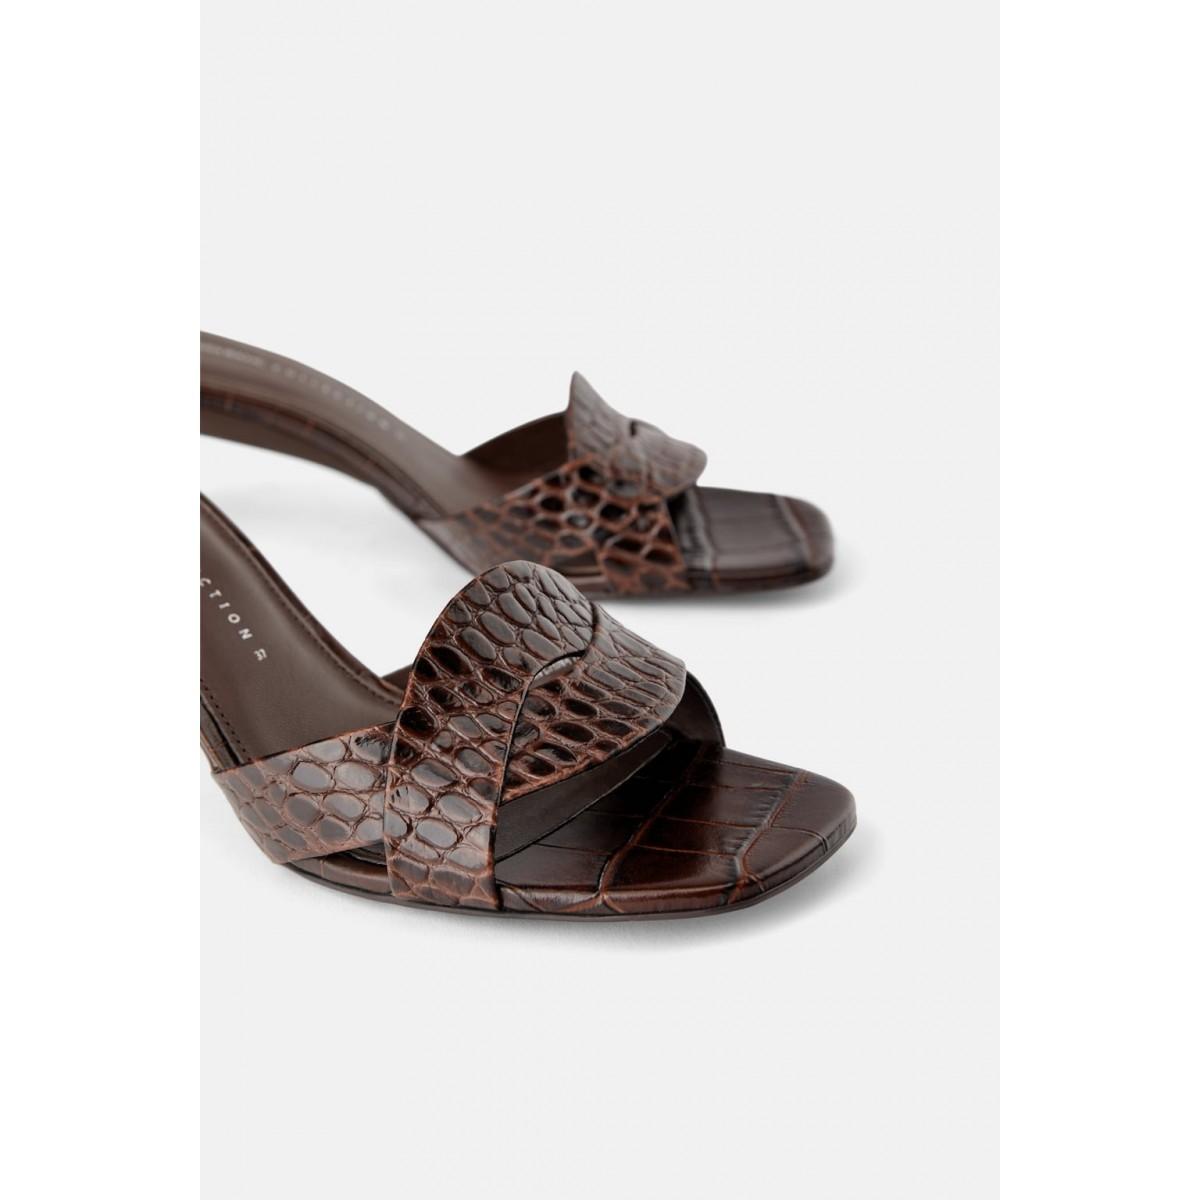 Zara Animal Print Leather High Heel Mules